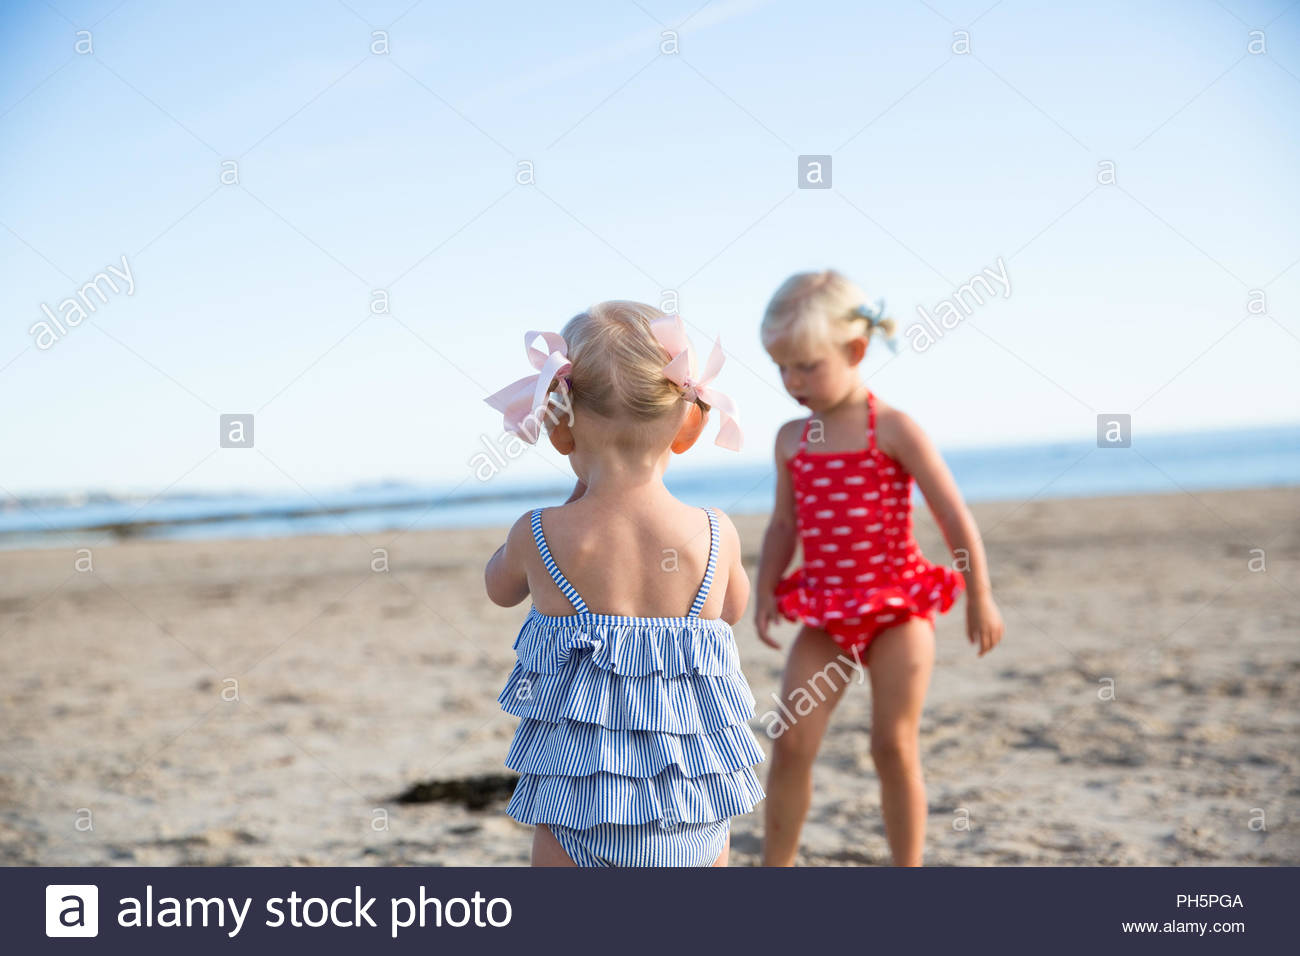 Hermanas en trajes de baño en la playa Imagen De Stock